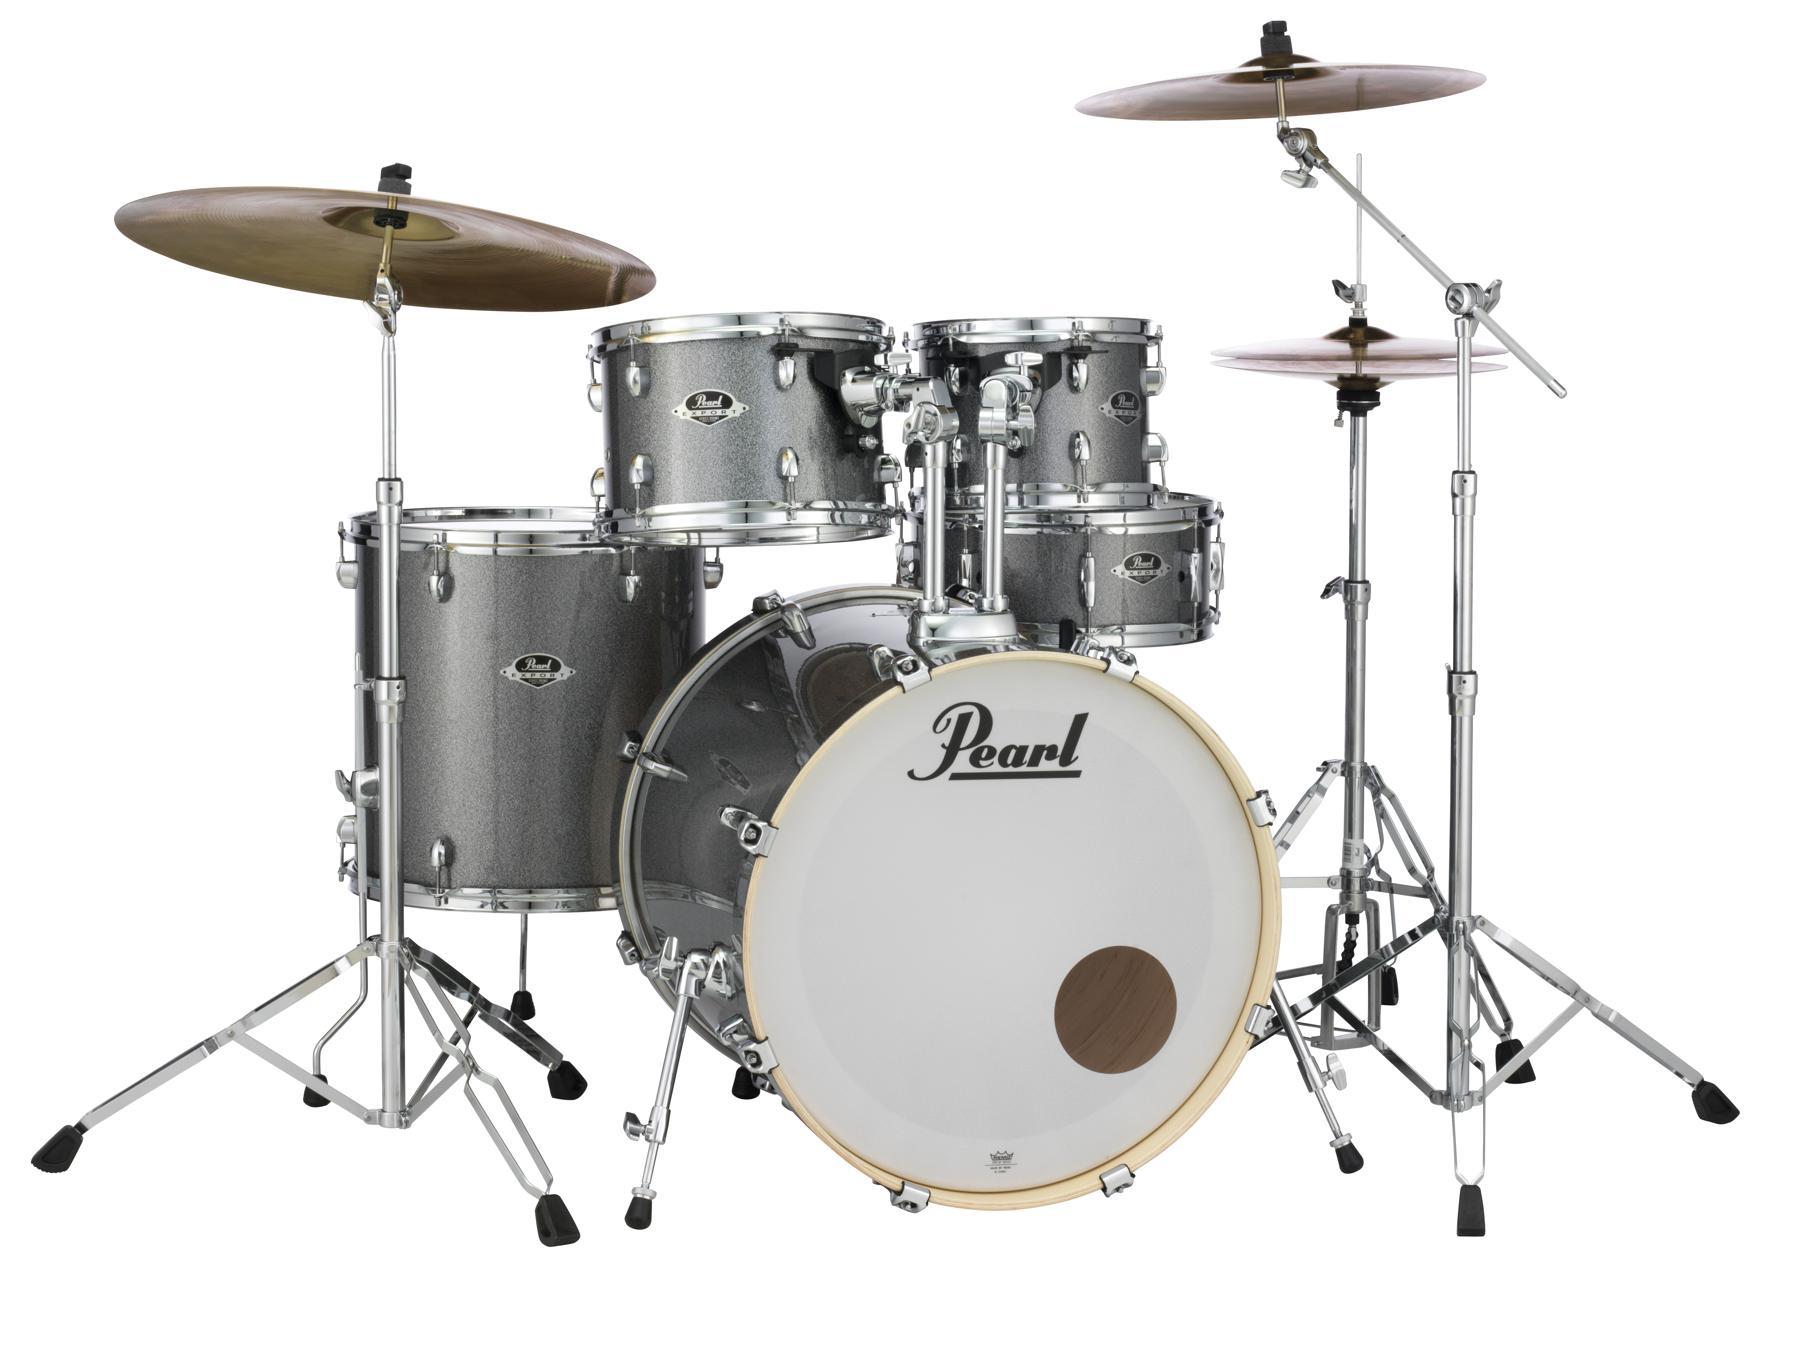 3. Pearl EXX725S/C 5